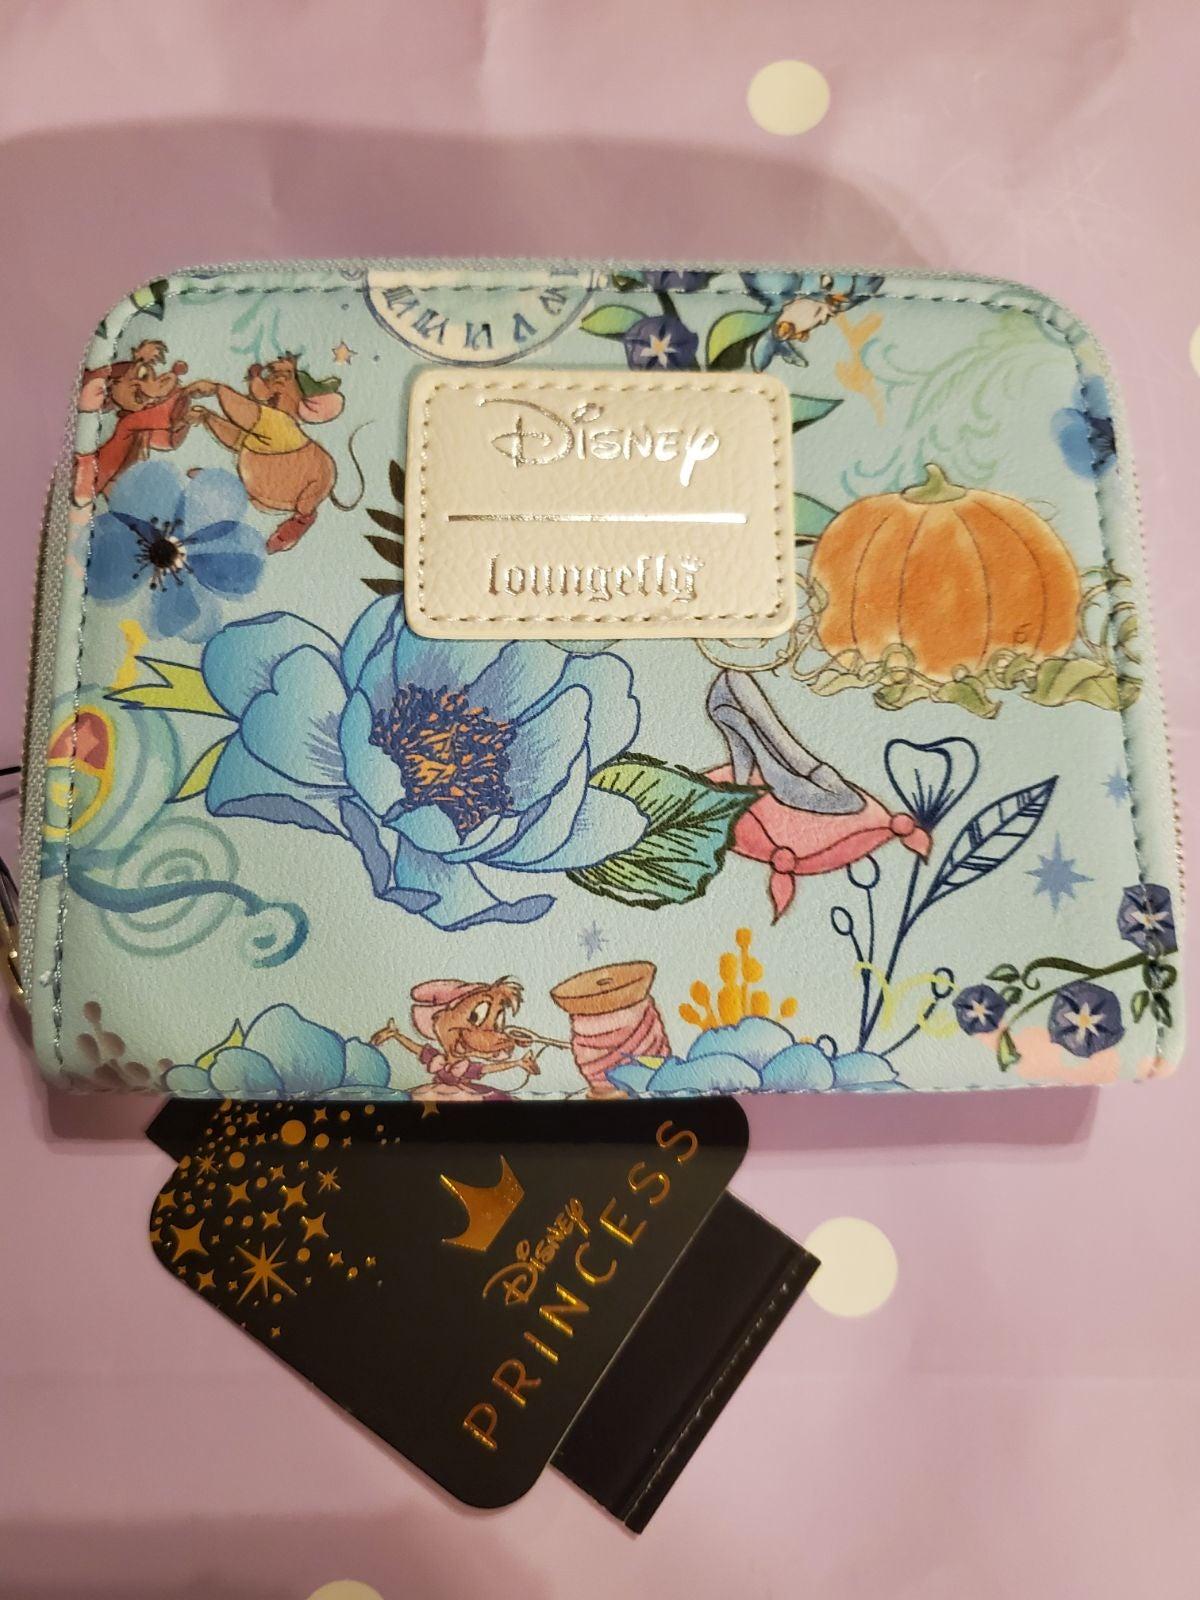 Loungefly Disney wallet